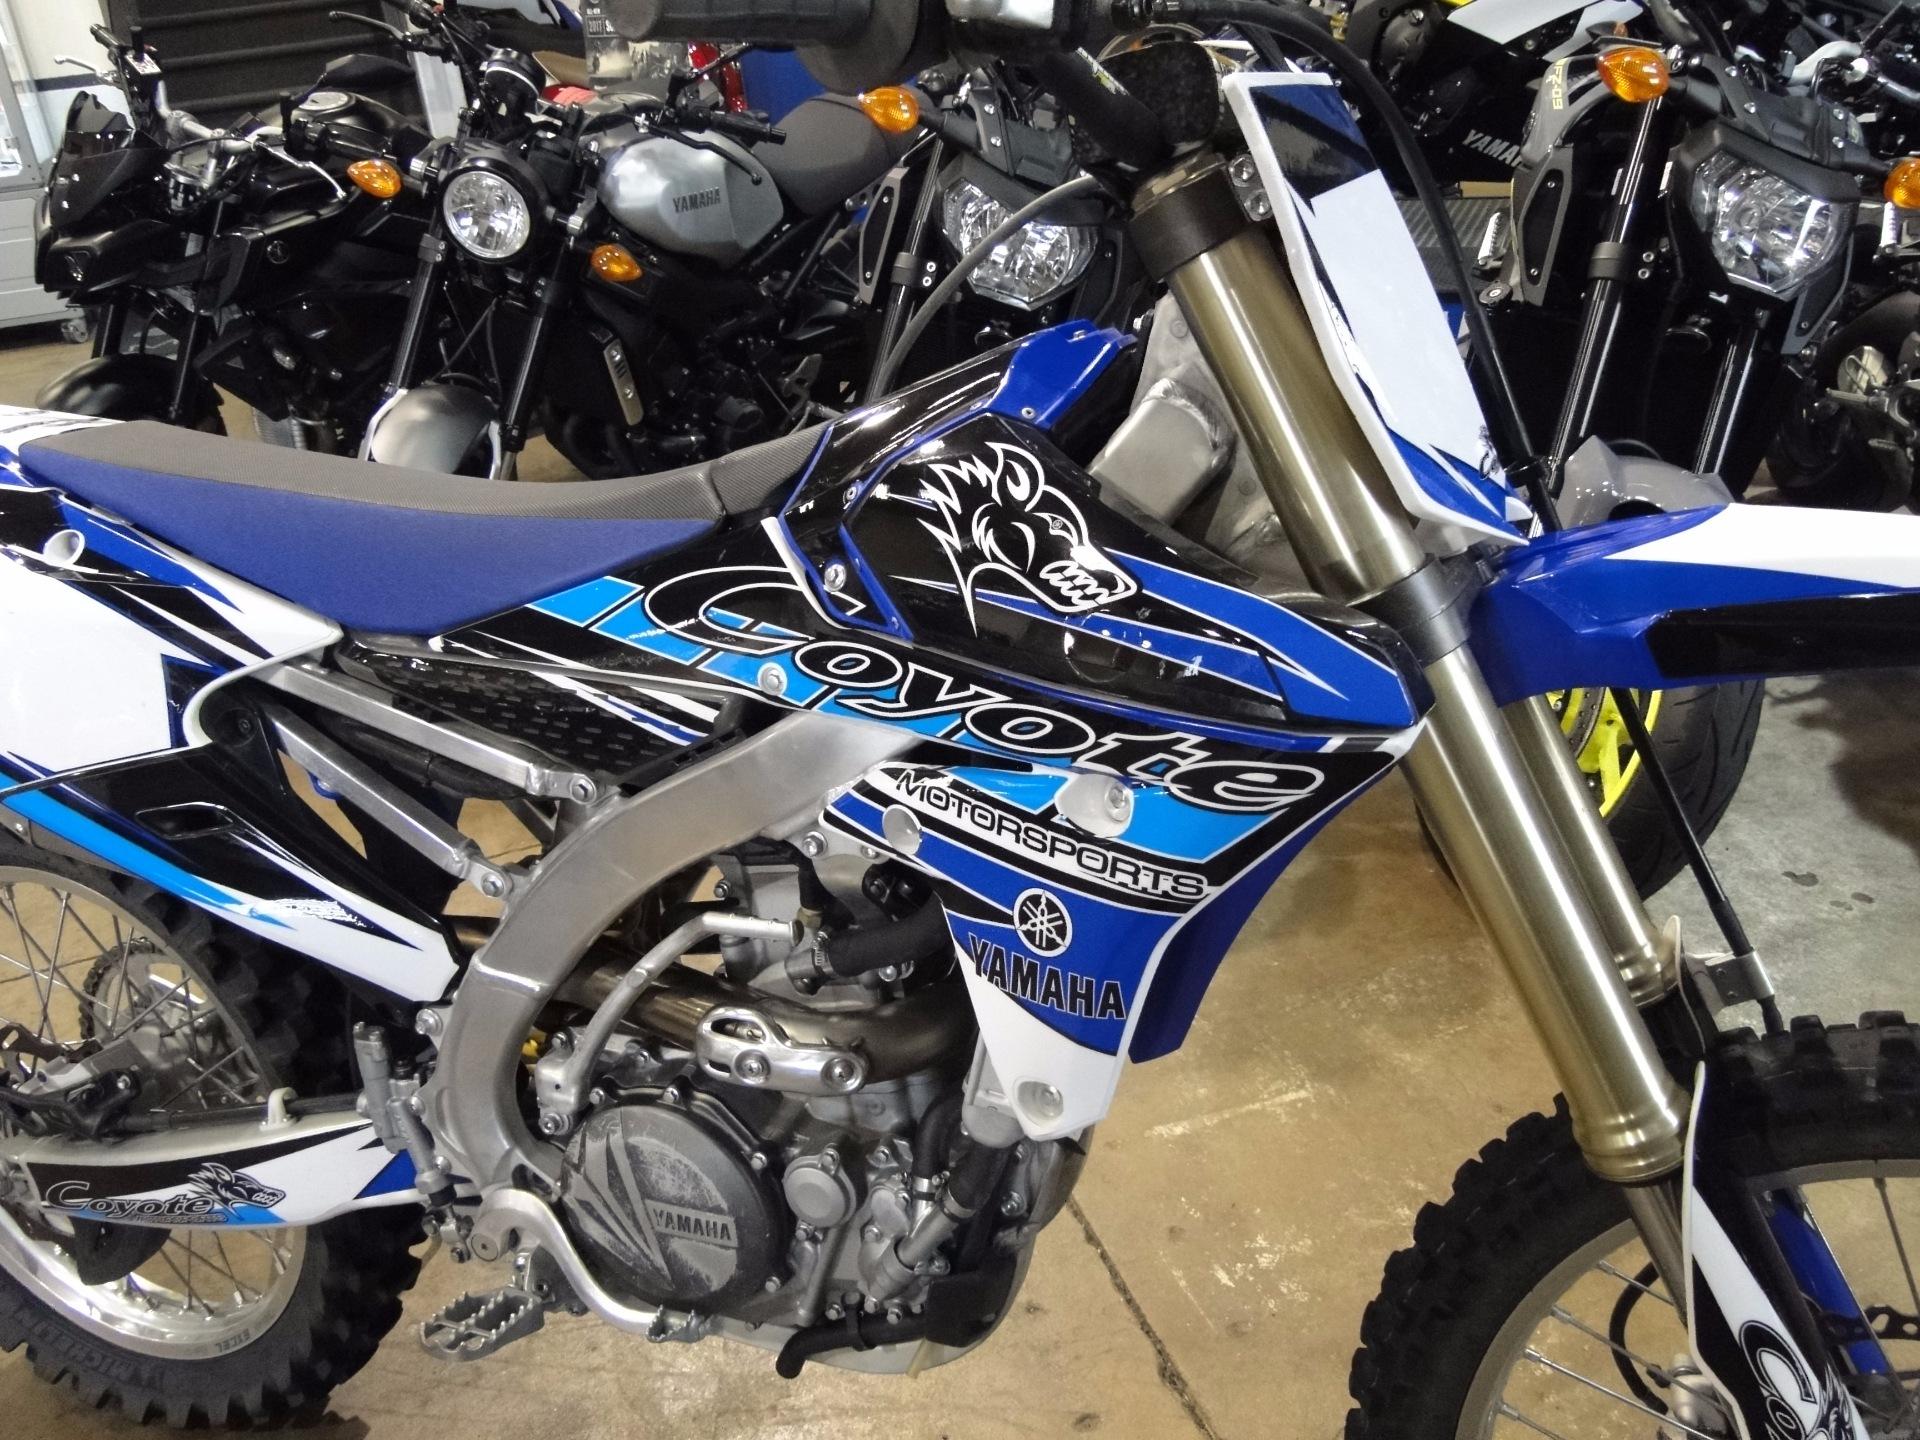 2014 Yamaha YZ450F in Denver, Colorado